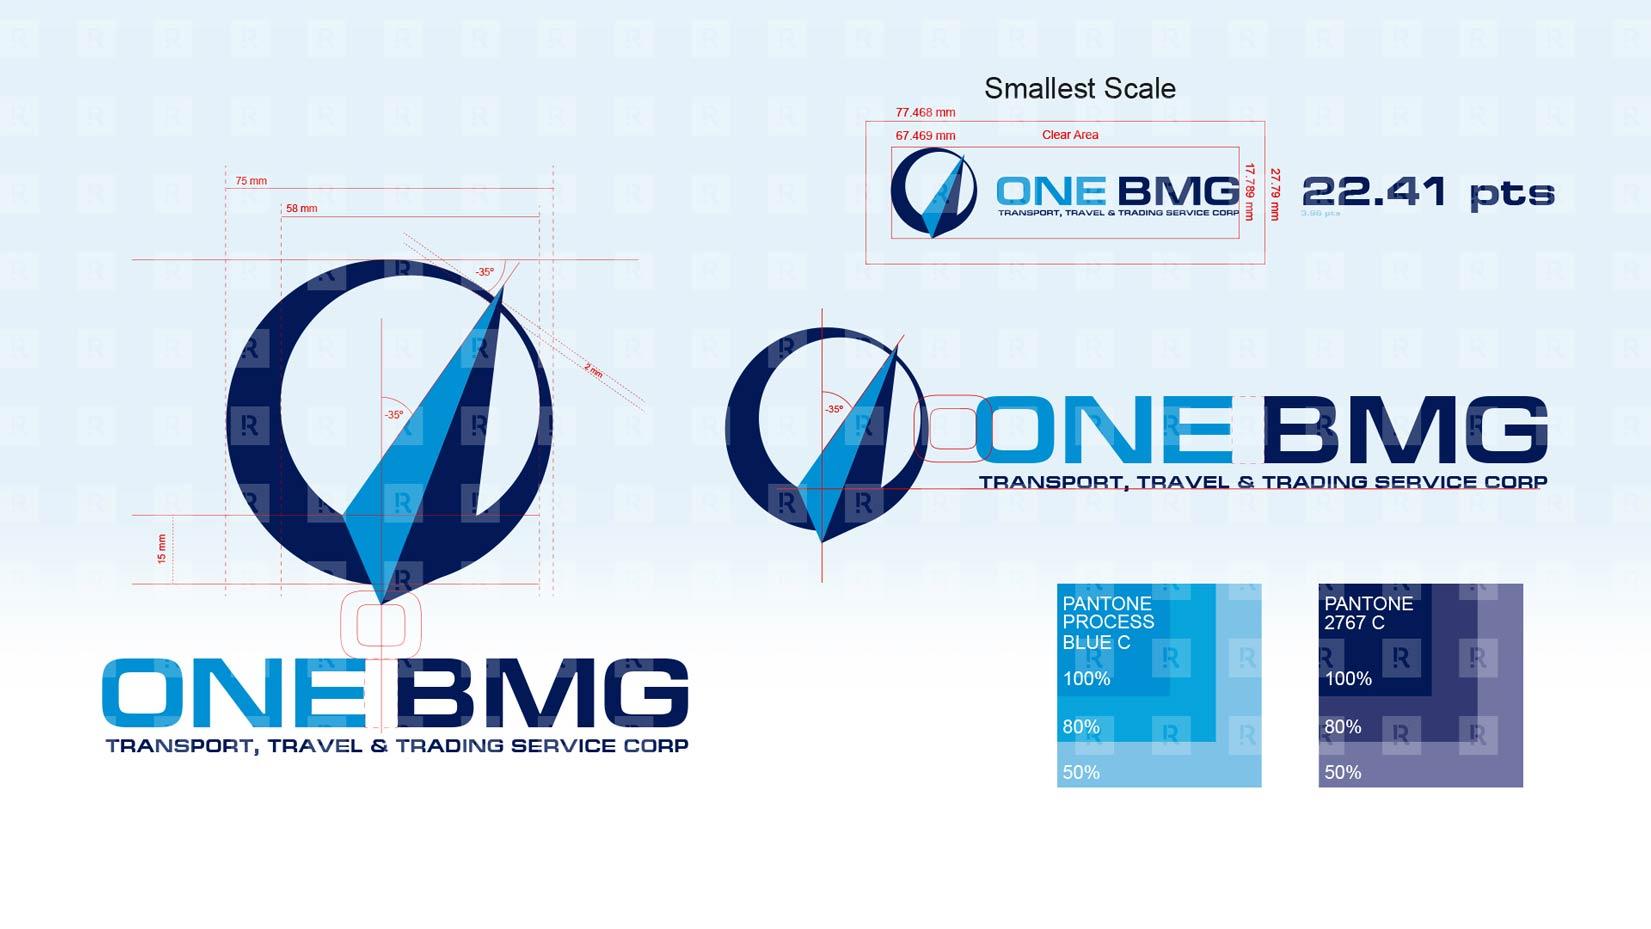 One BMG Corporate Identity